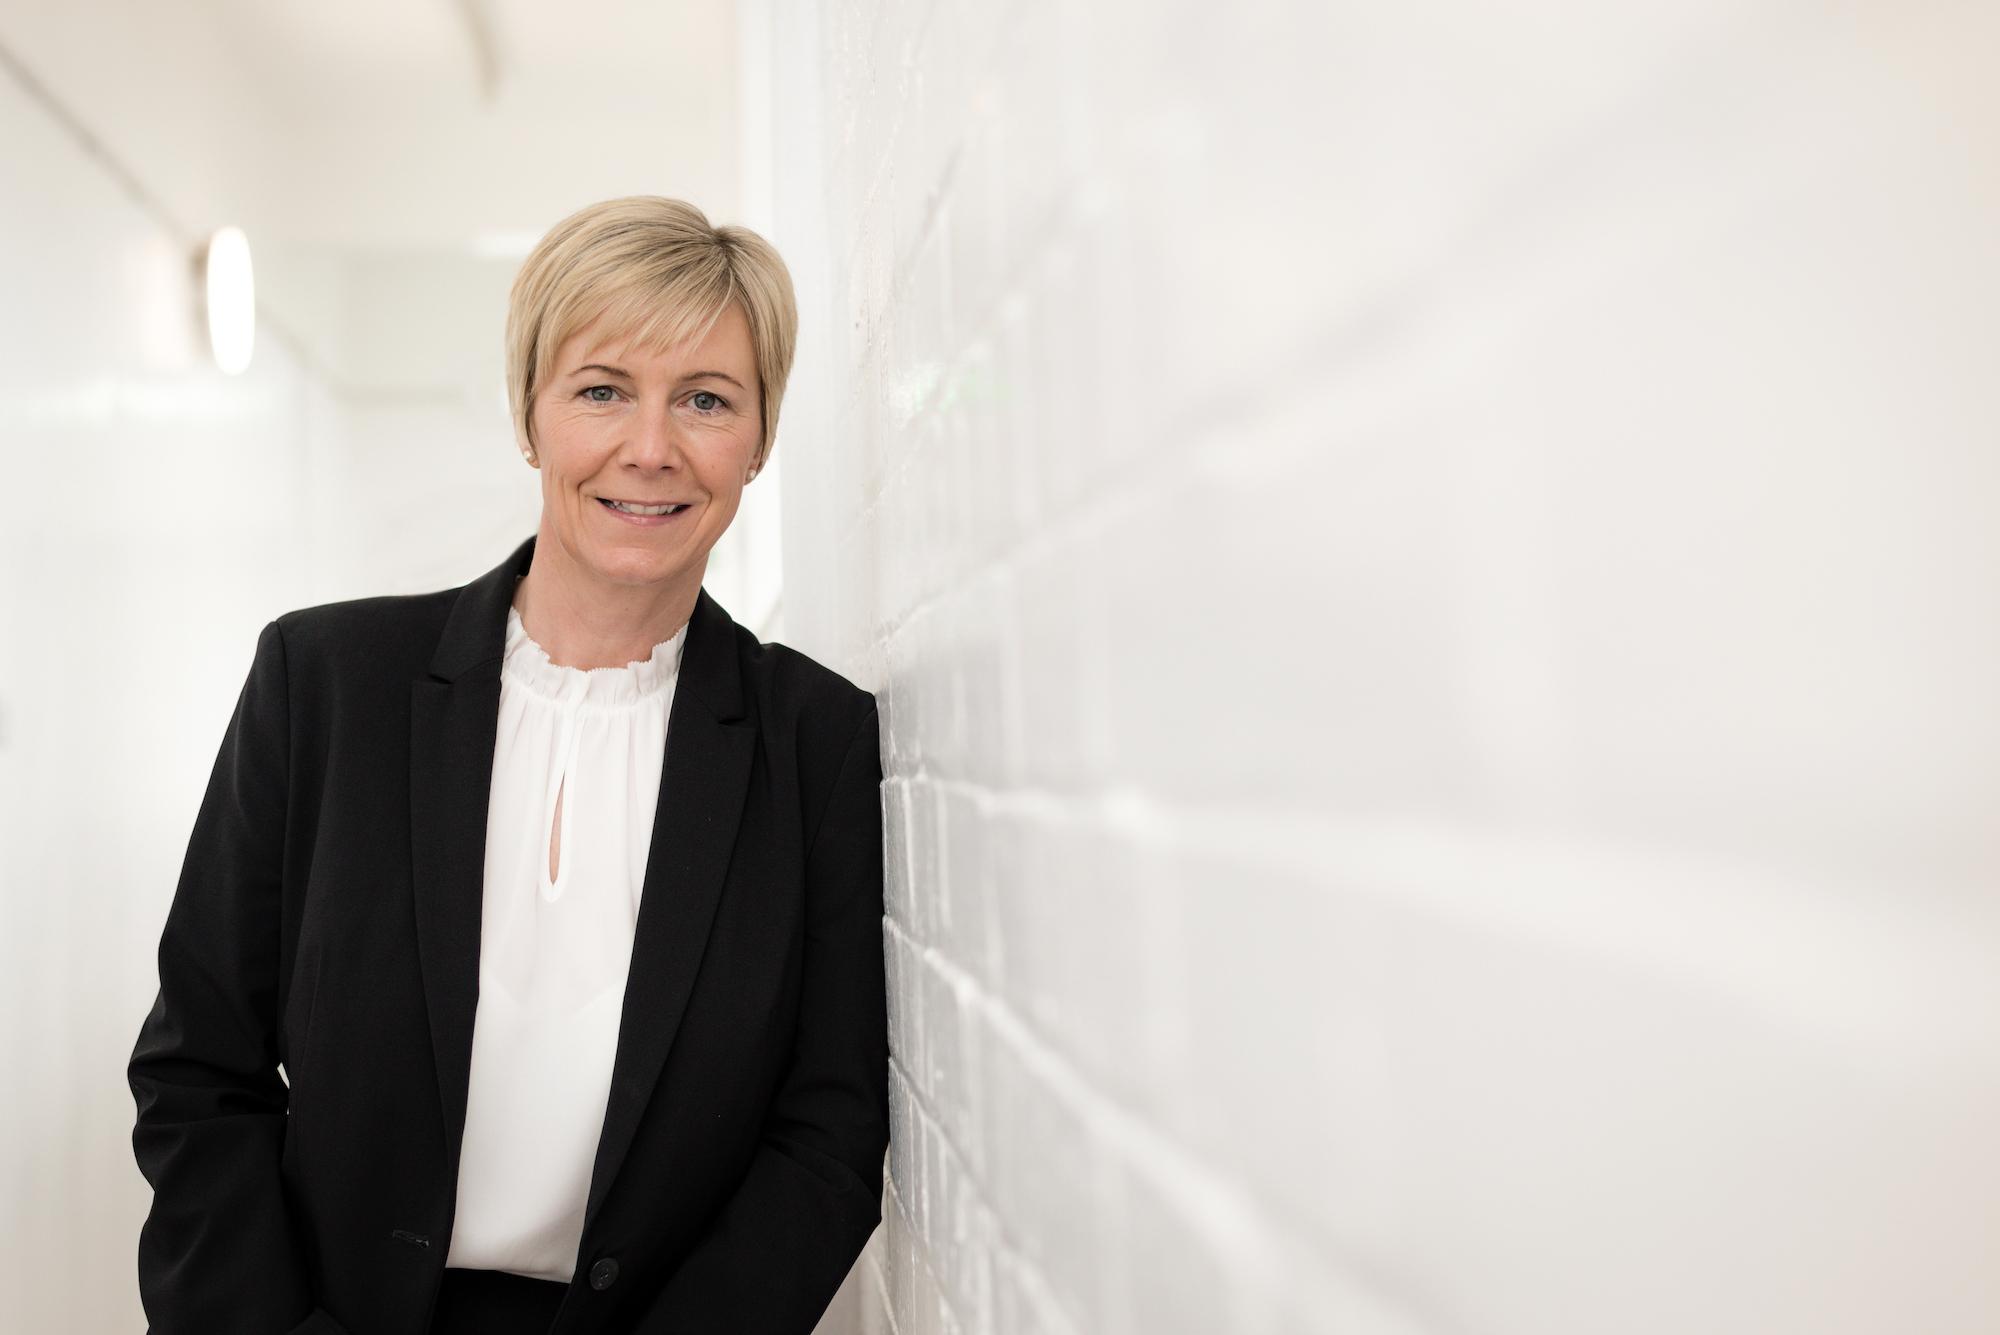 Sarah Ellerby, the CEO of Nova Pangaea Technologies